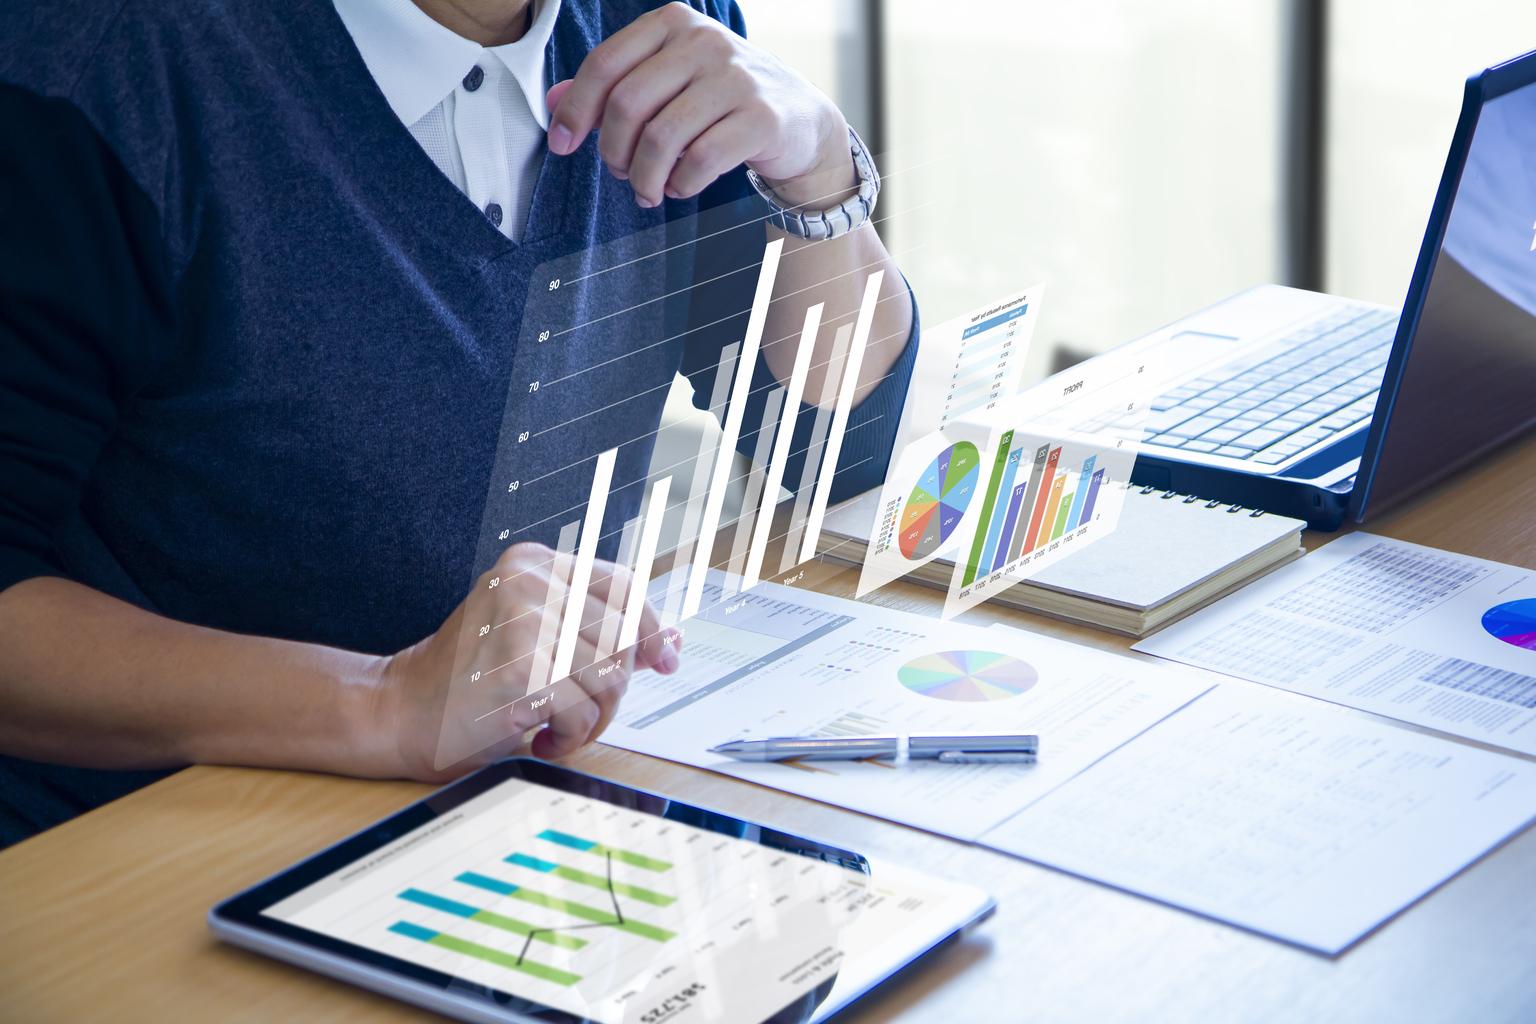 business-man-expanding-futuristic-virtual-screen-modern-tablet